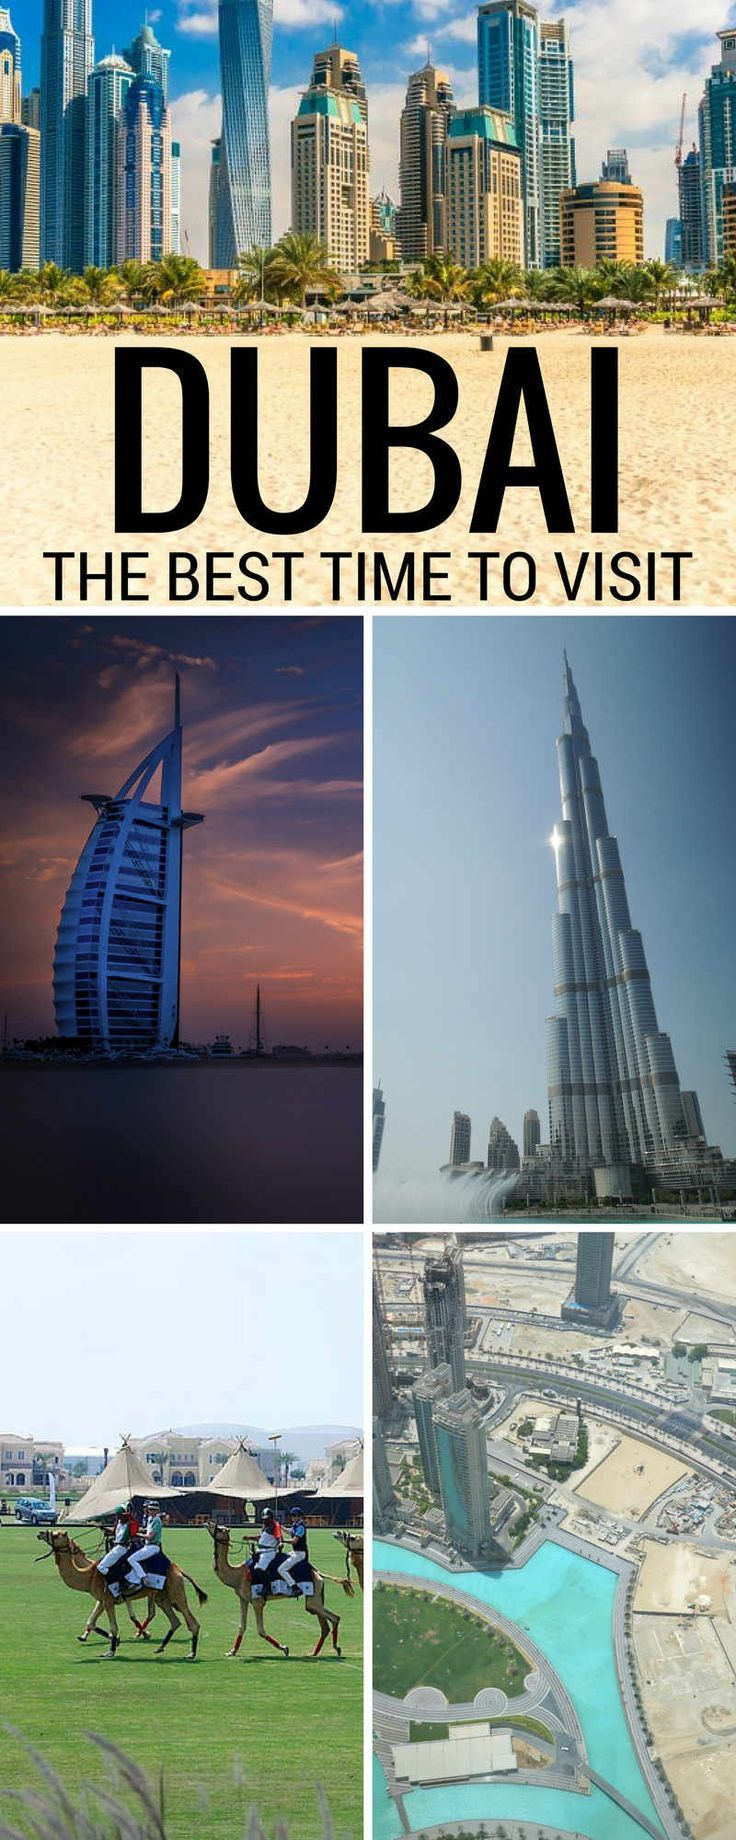 Fame Dubai Home Famedubai Magazine Your Daily Dose Of Lifestyle Shopping Trends In Uae Visit Dubai Island Travel Jamaica Travel